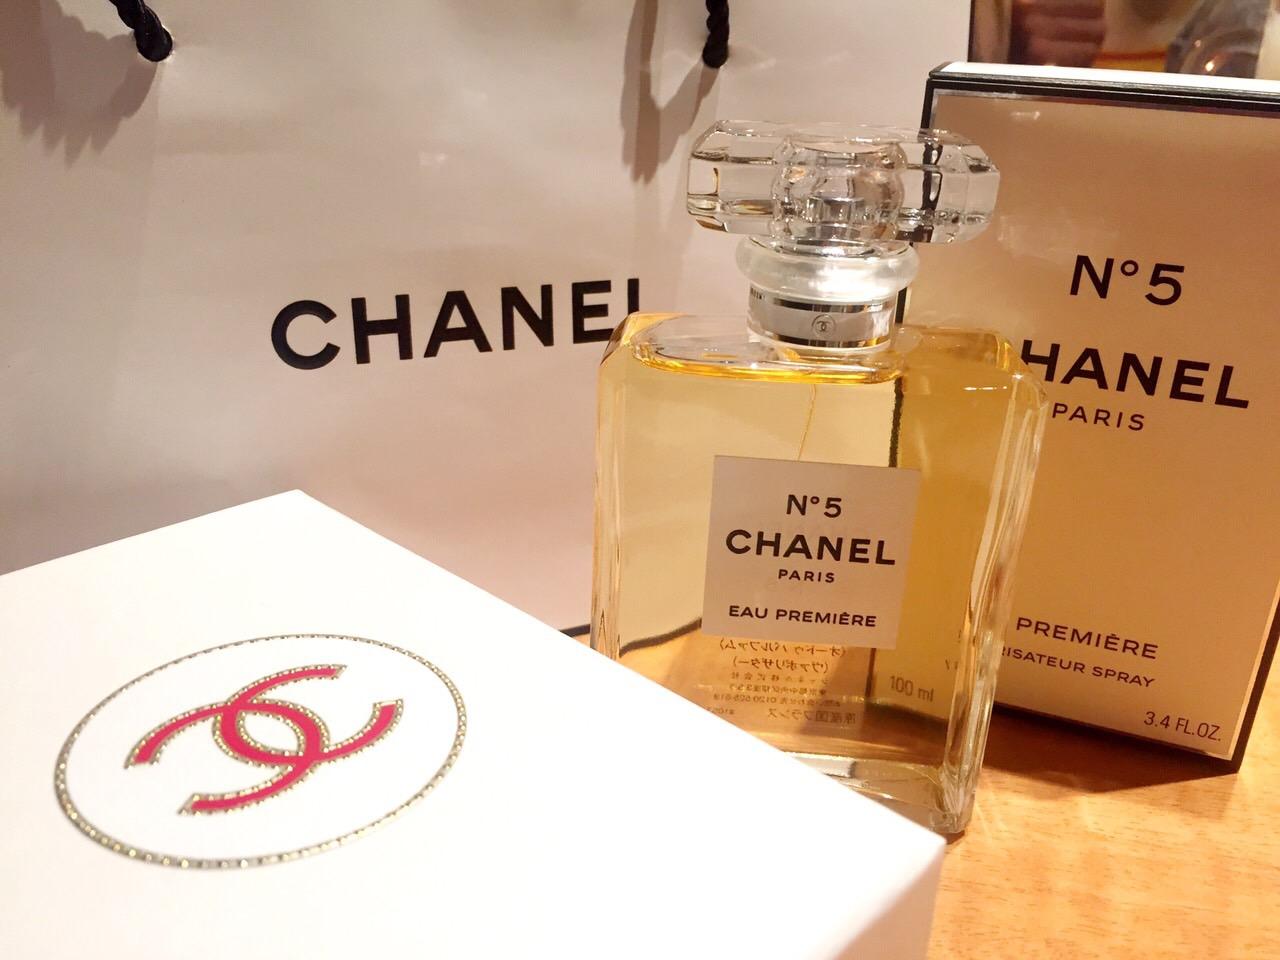 CHANEL 香水 No.5 オープルミエール